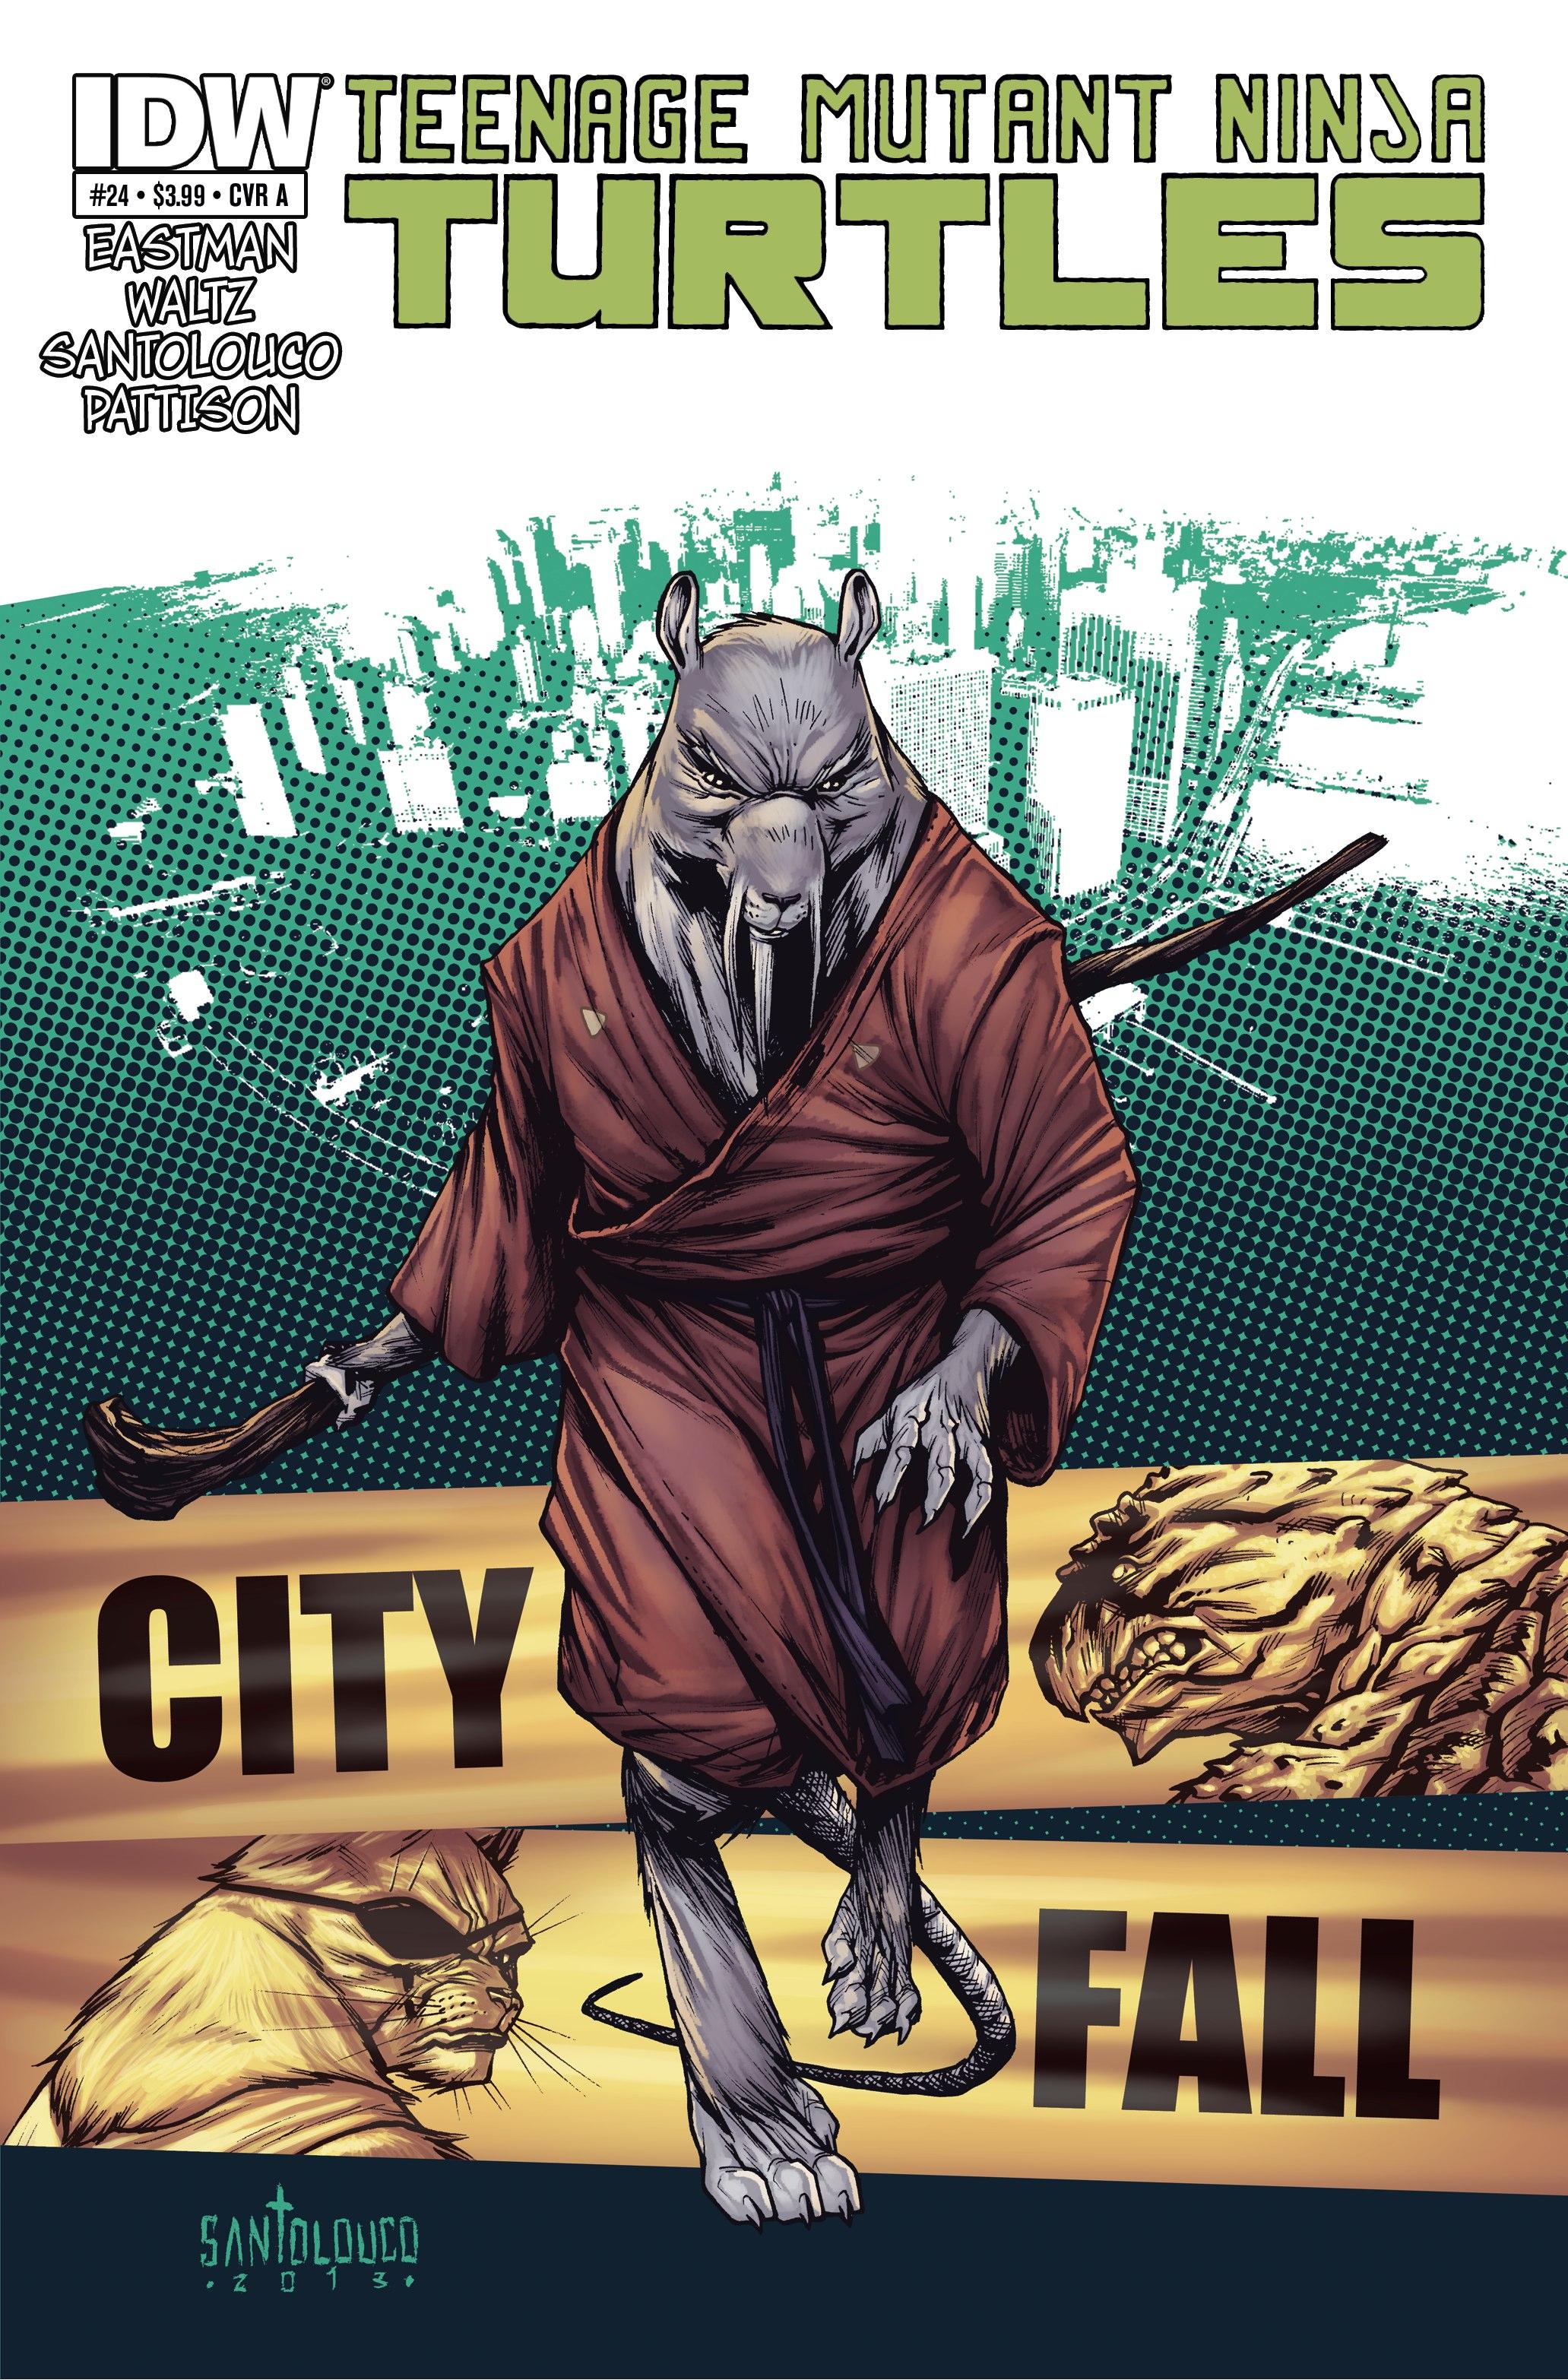 City Fall, part 3